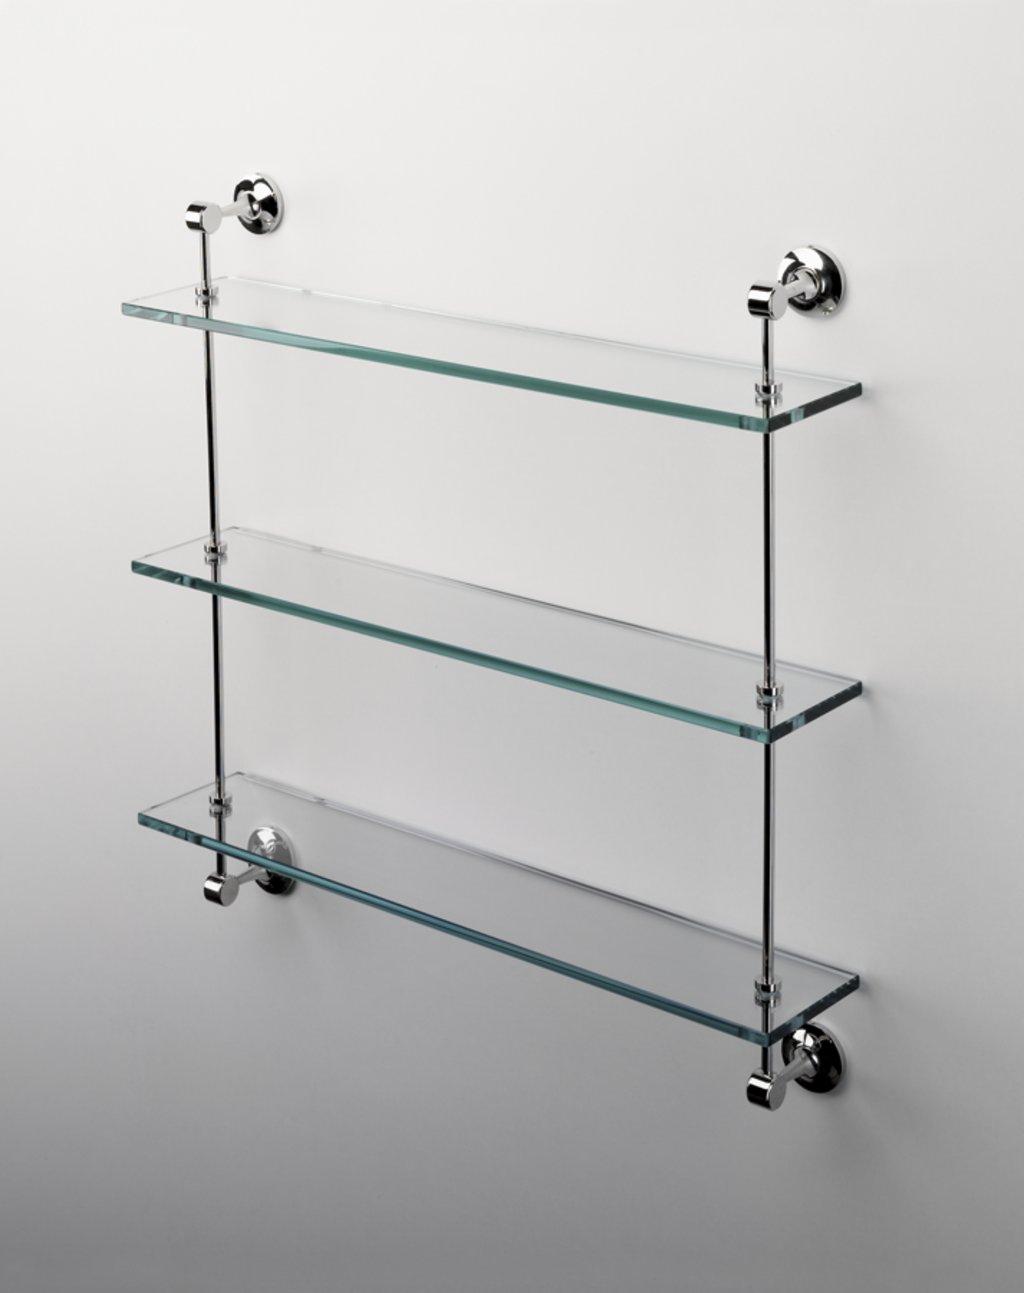 Vanity mr barr for Jaquar bathroom accessories catalogue